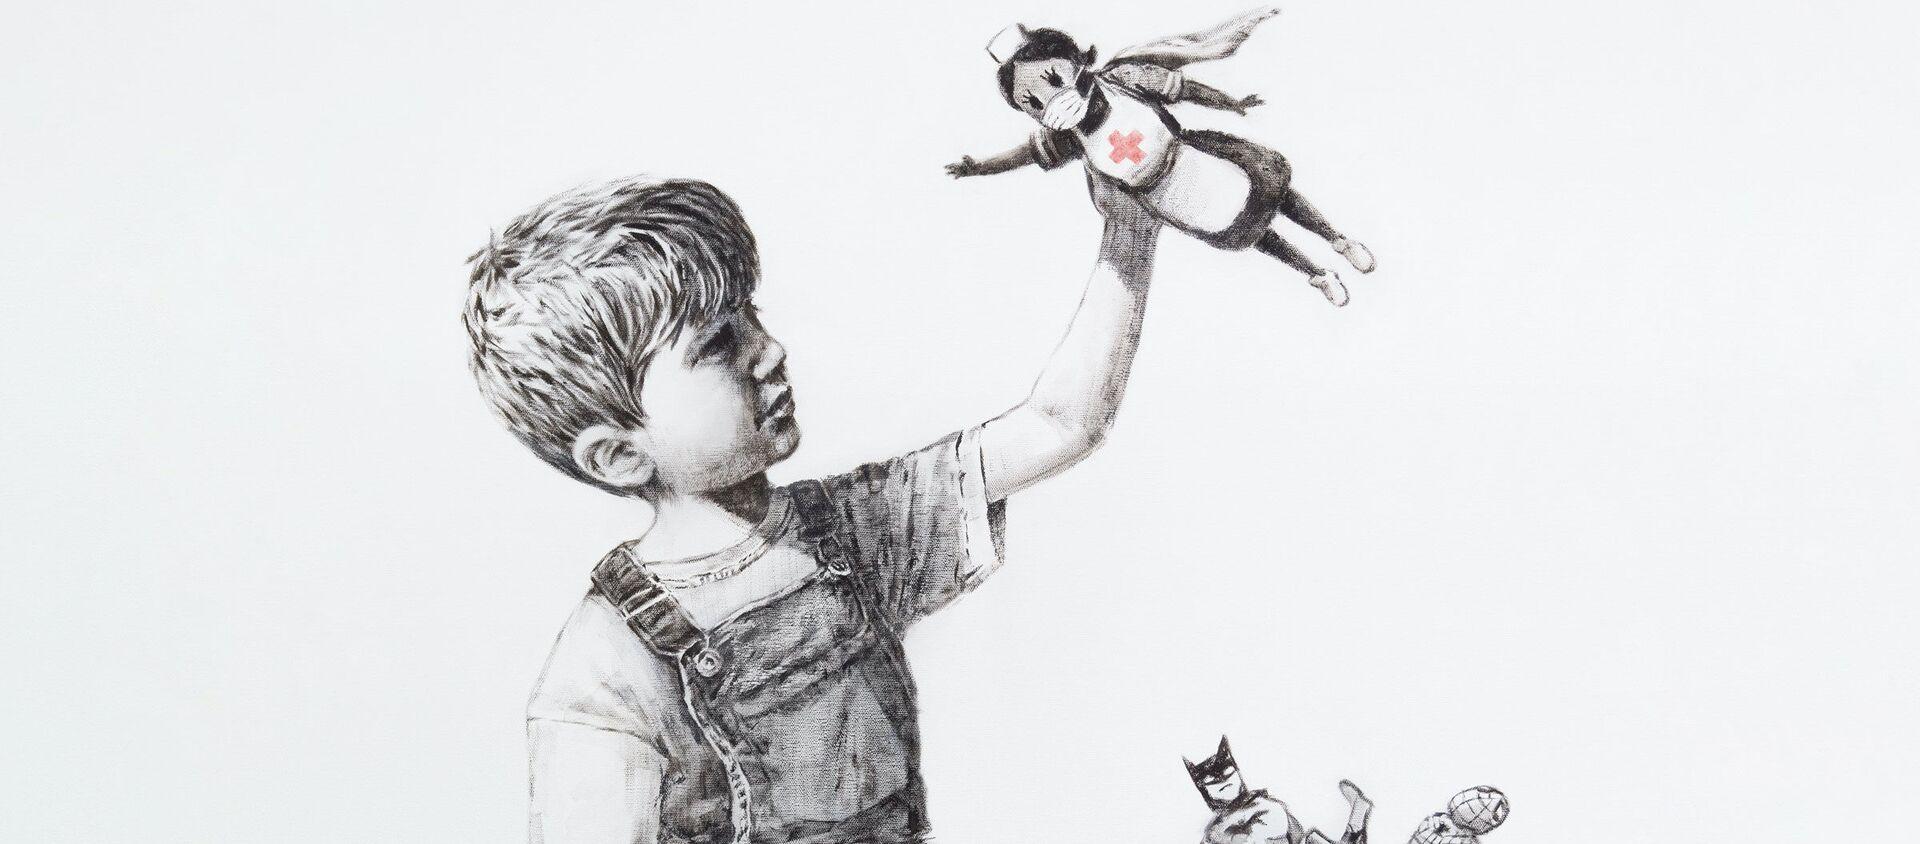 Tranh mới của Banksy - Sputnik Việt Nam, 1920, 07.05.2020